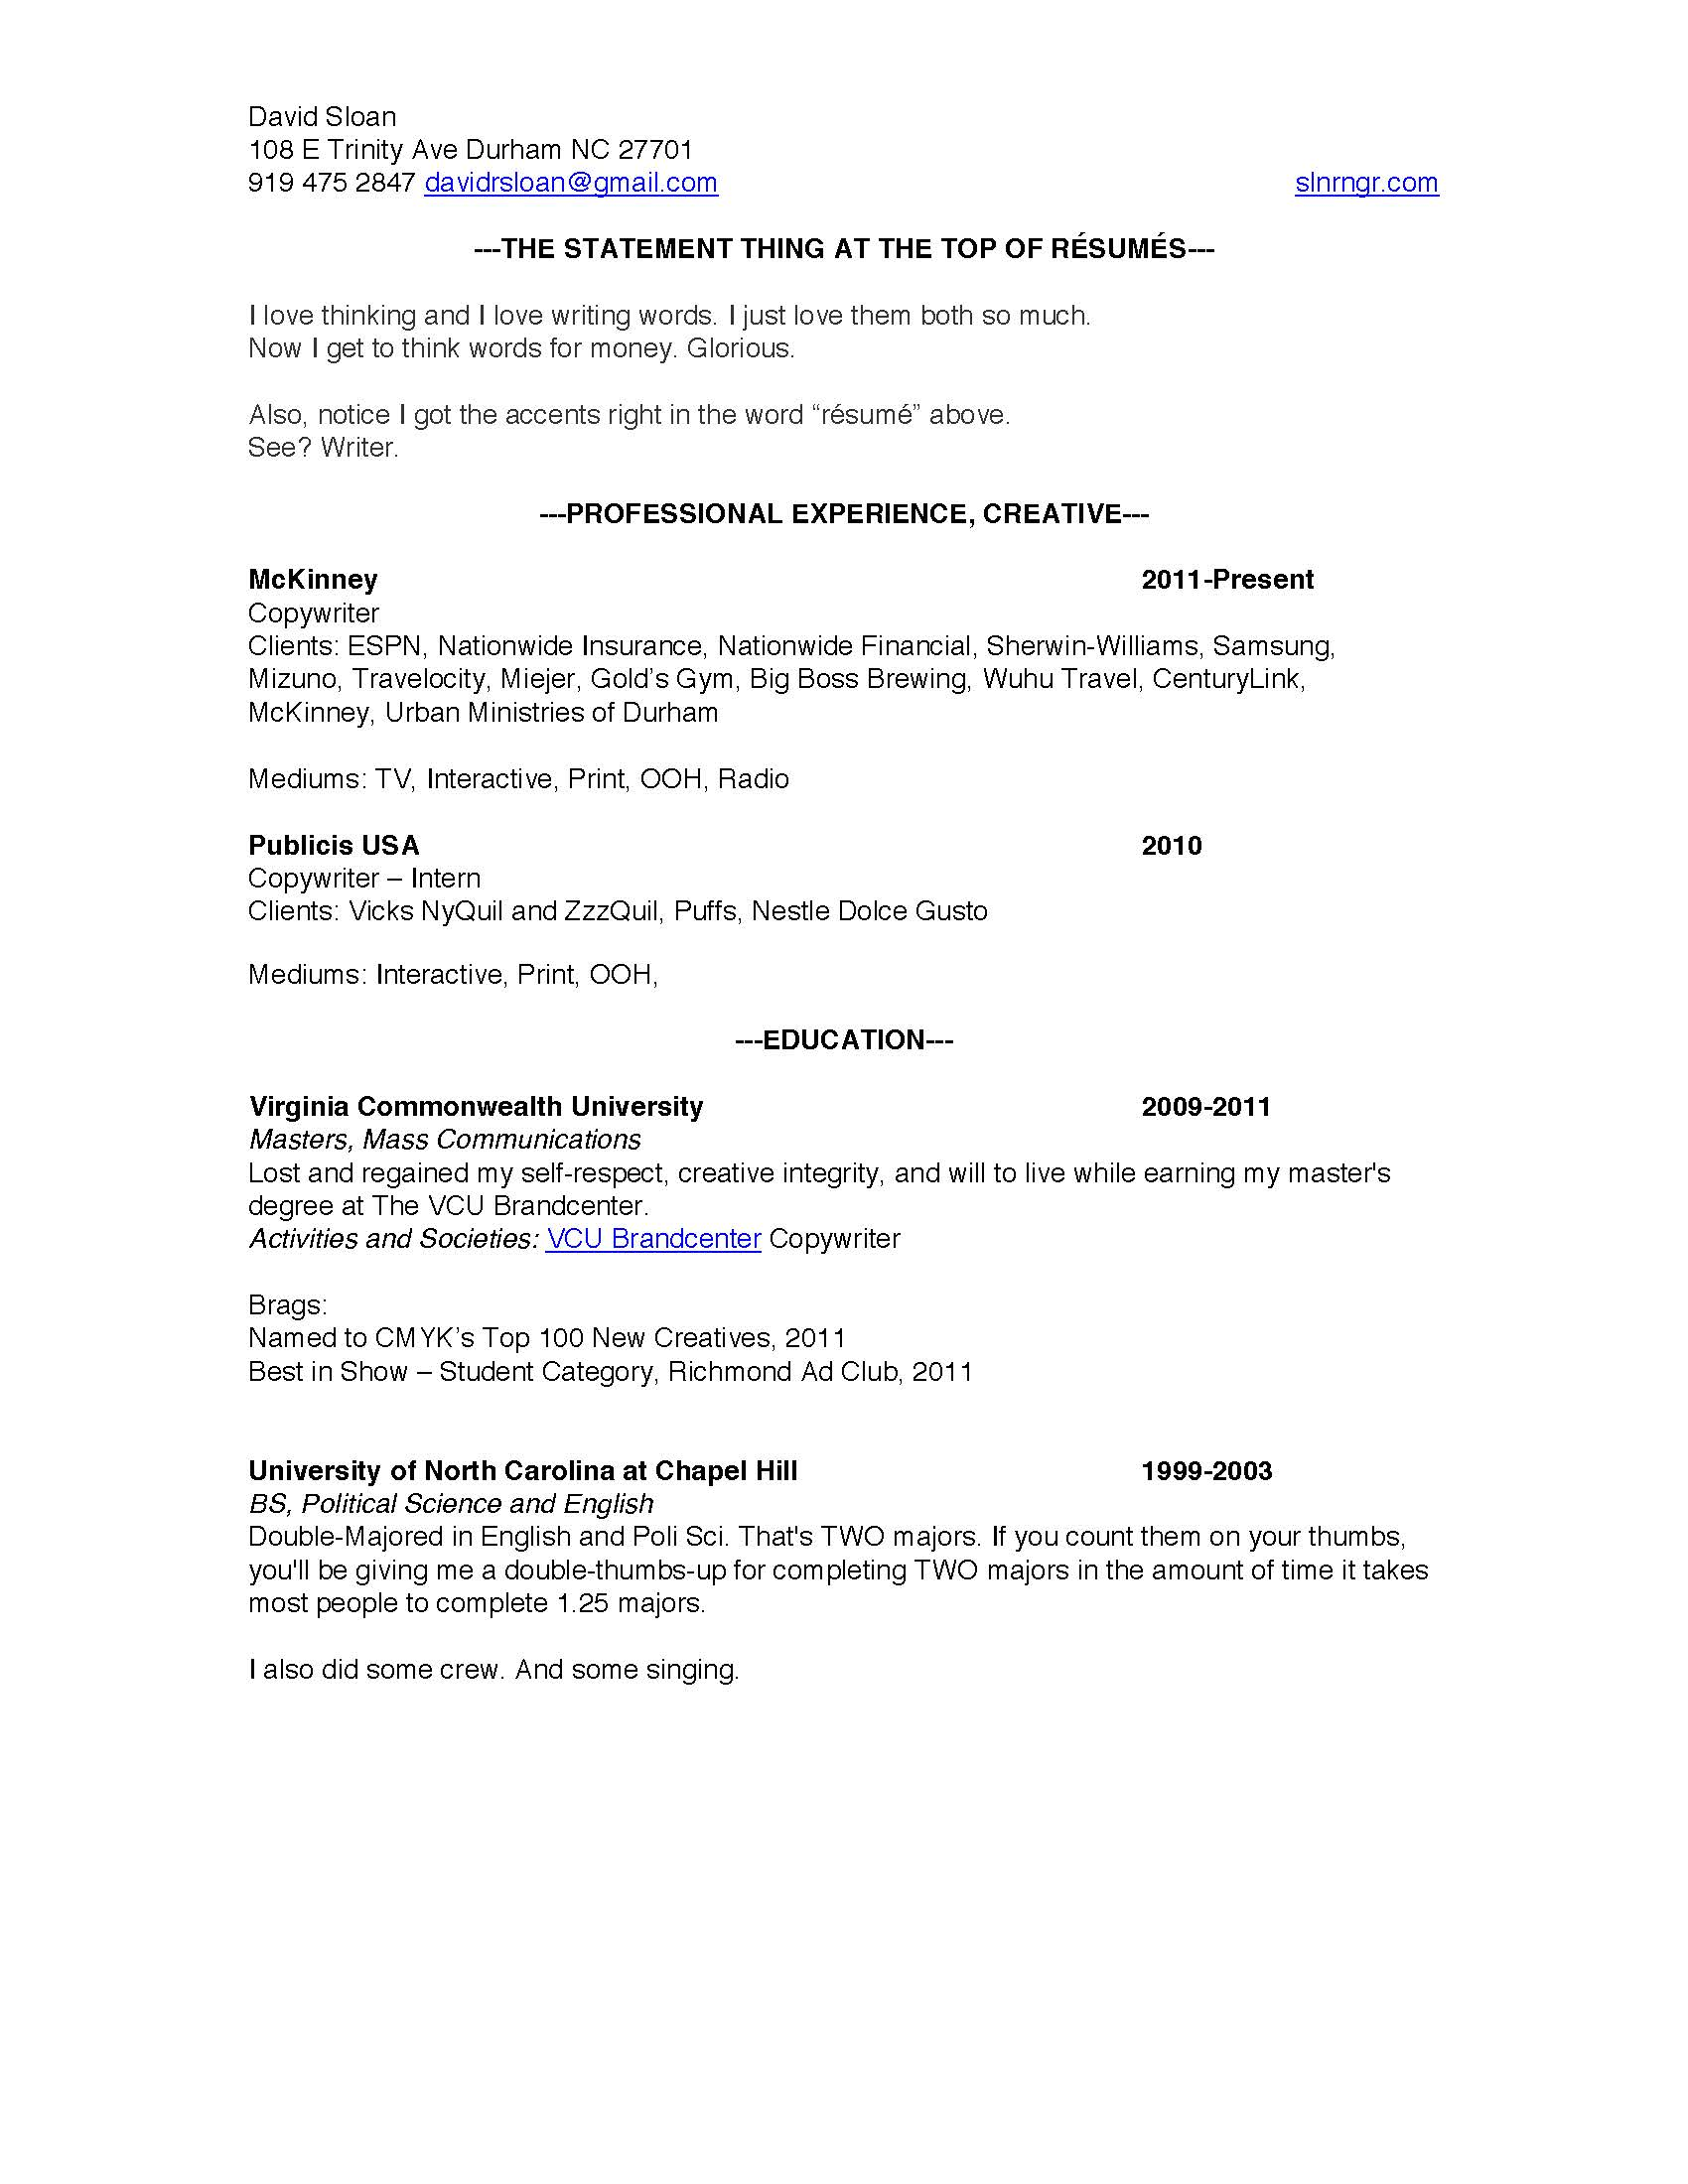 David Sloan Resume Feb 2014_Page_1.jpg